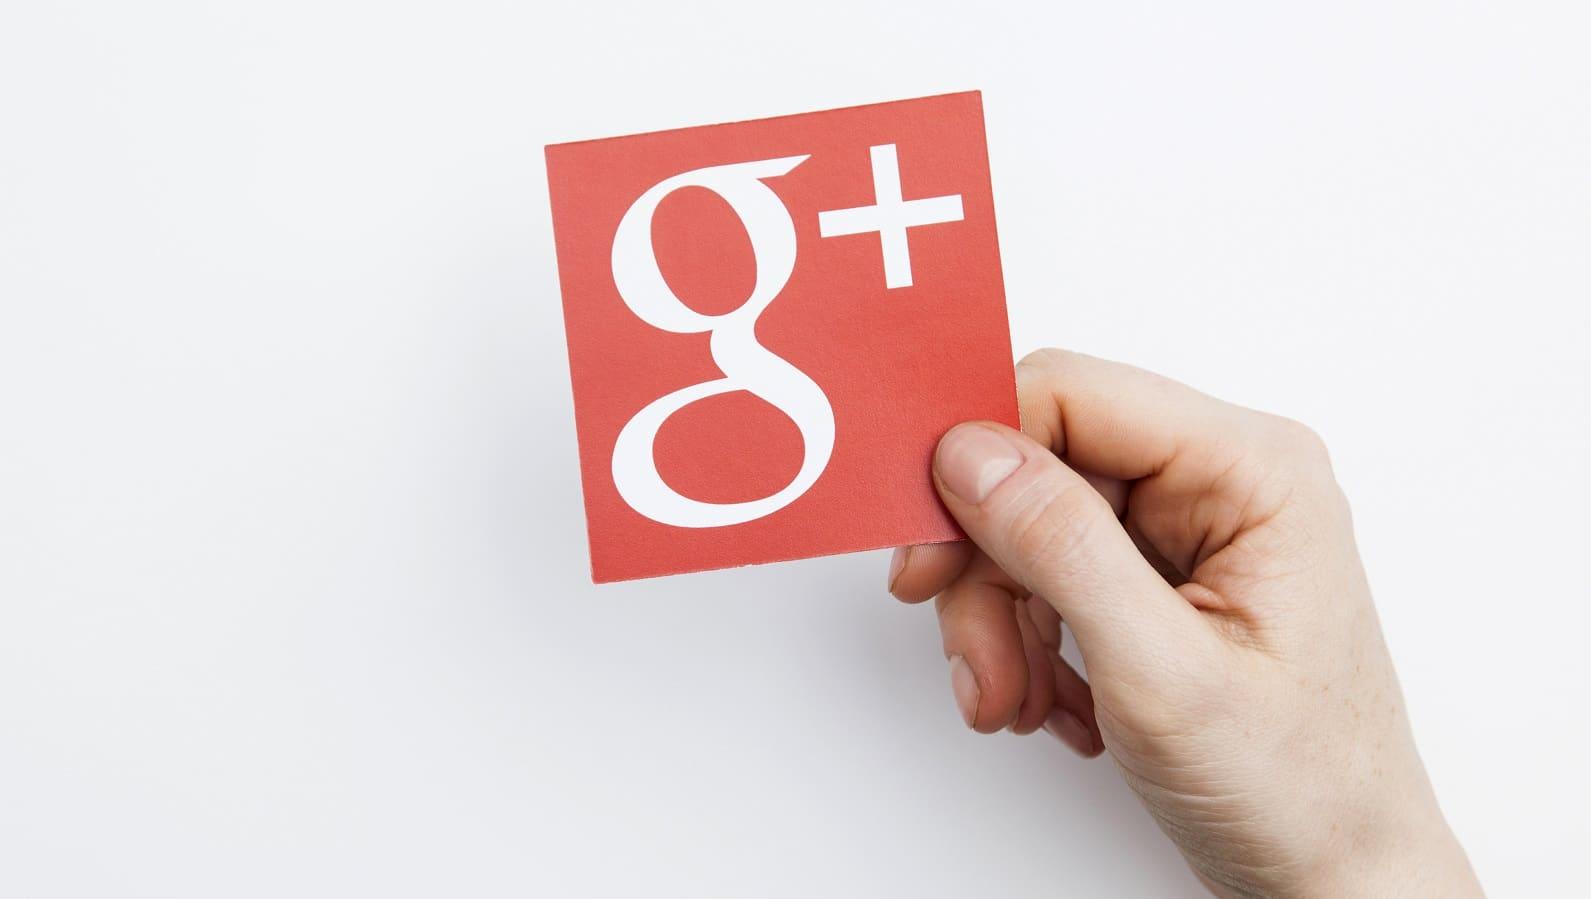 google plus logo on paper